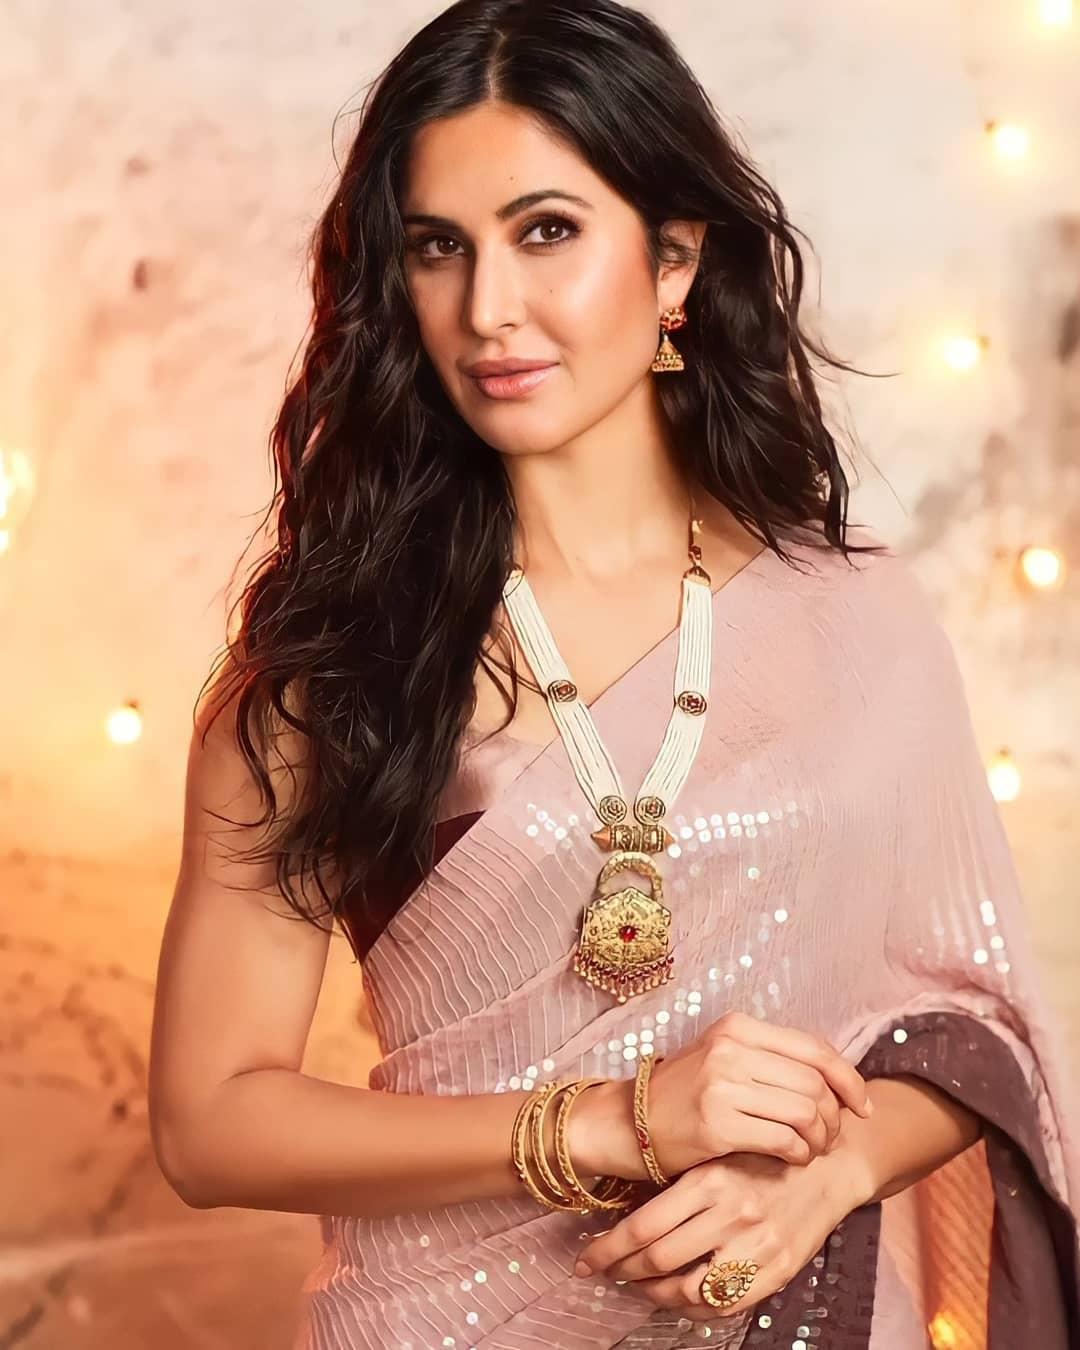 Katrina Kaif in manish malhotra for kalyan jewellers